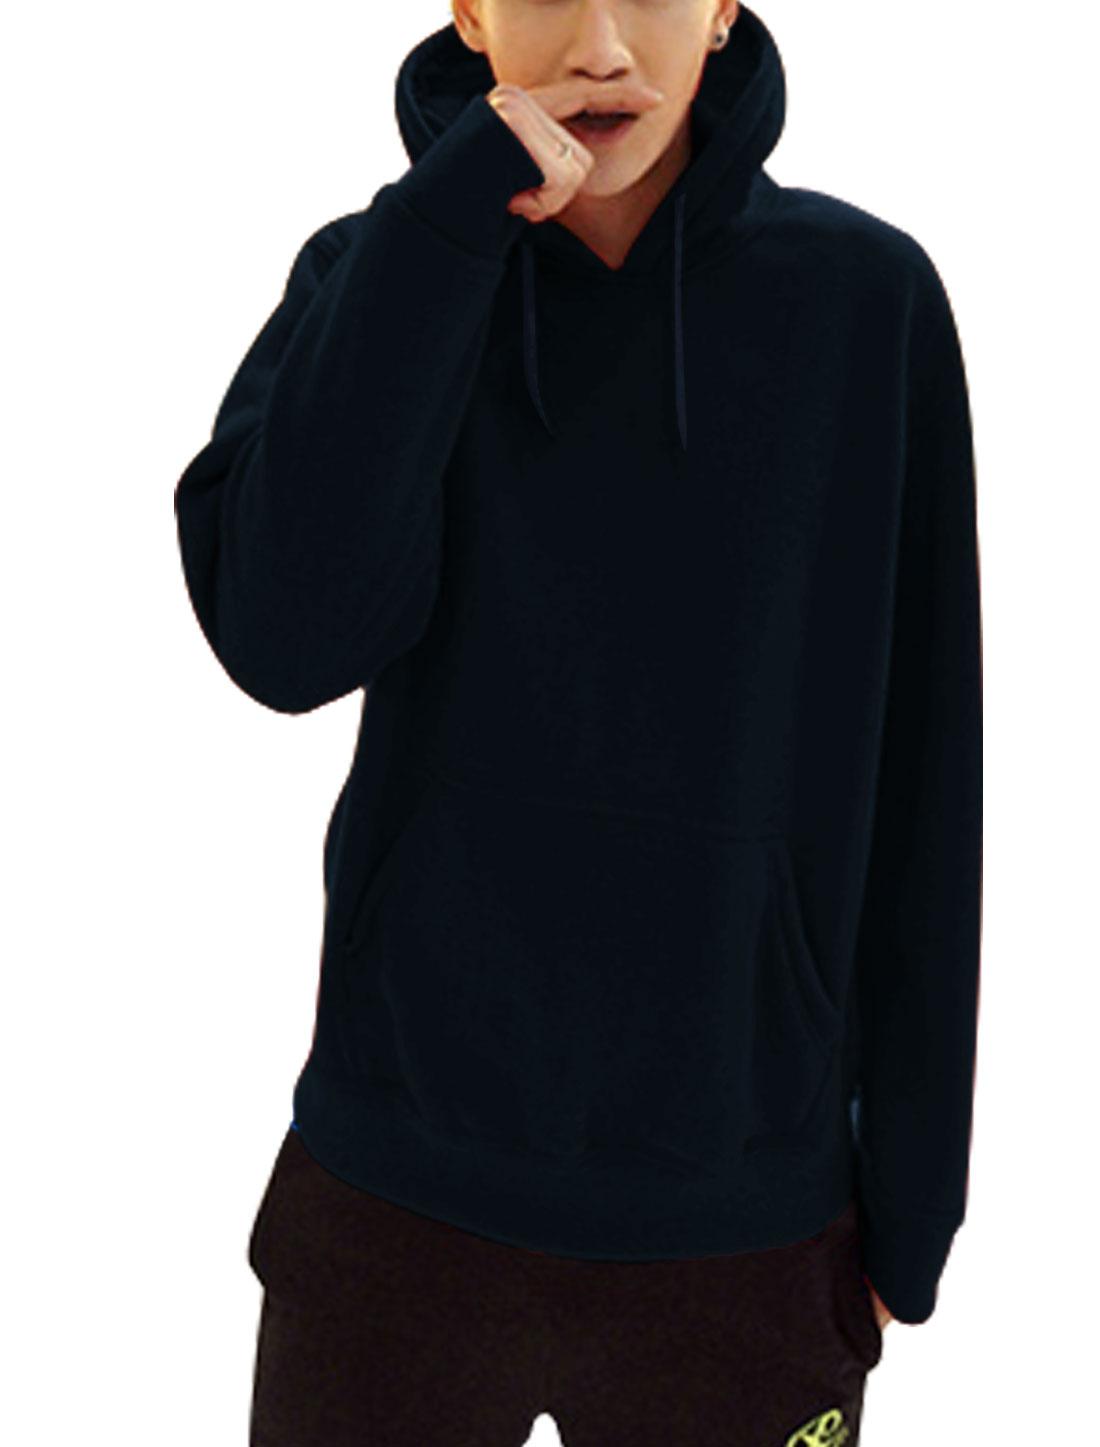 Men Single Kangaroo Pcoket Drawcord Chic Thick Hoodie Navy Blue L